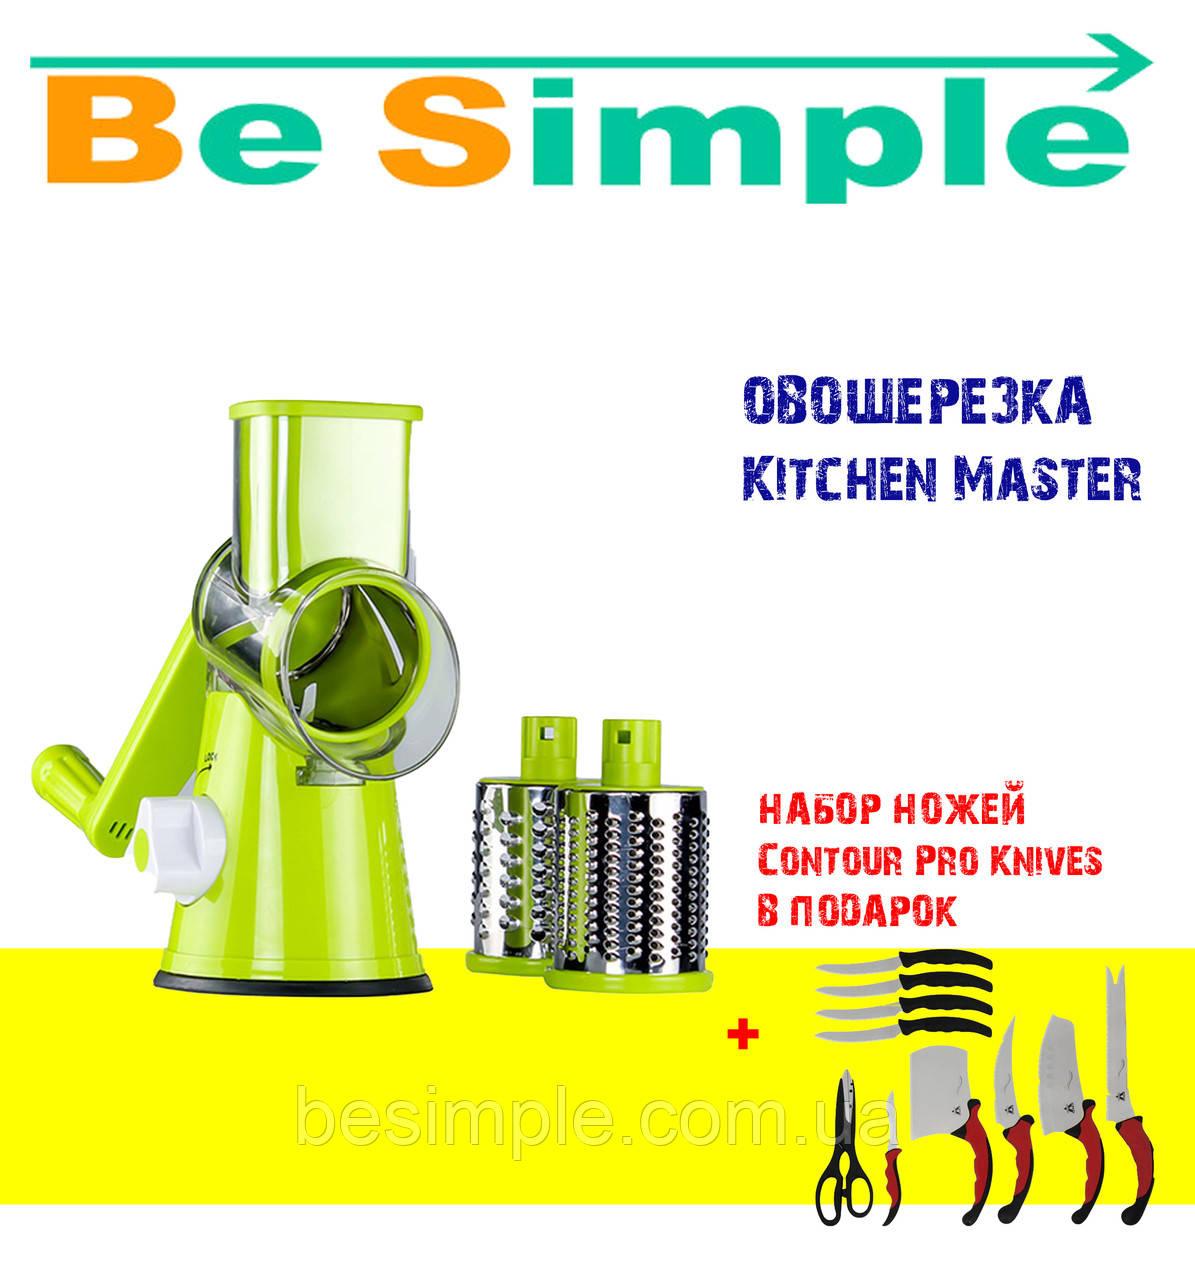 Мультислайсер Kitchen Master + Набор кухонных ножей Contour Pro Knives